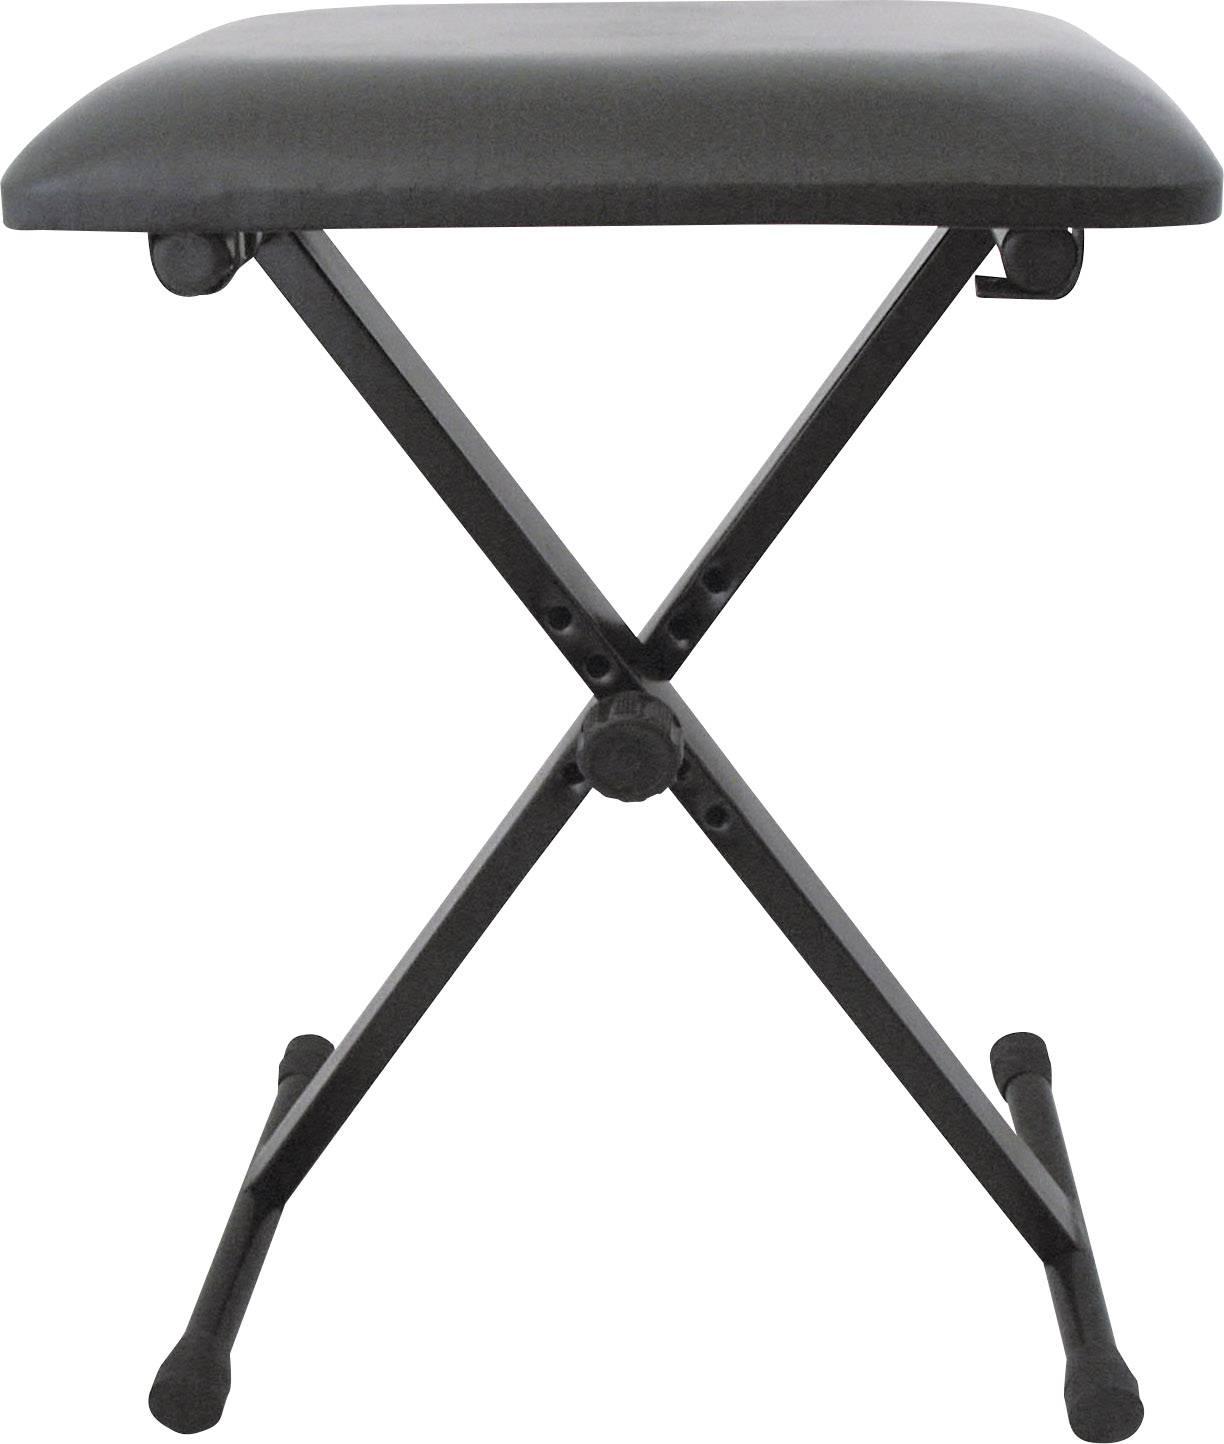 Stolička ku klávesom MSA Musikinstrumente KB 4, čierna